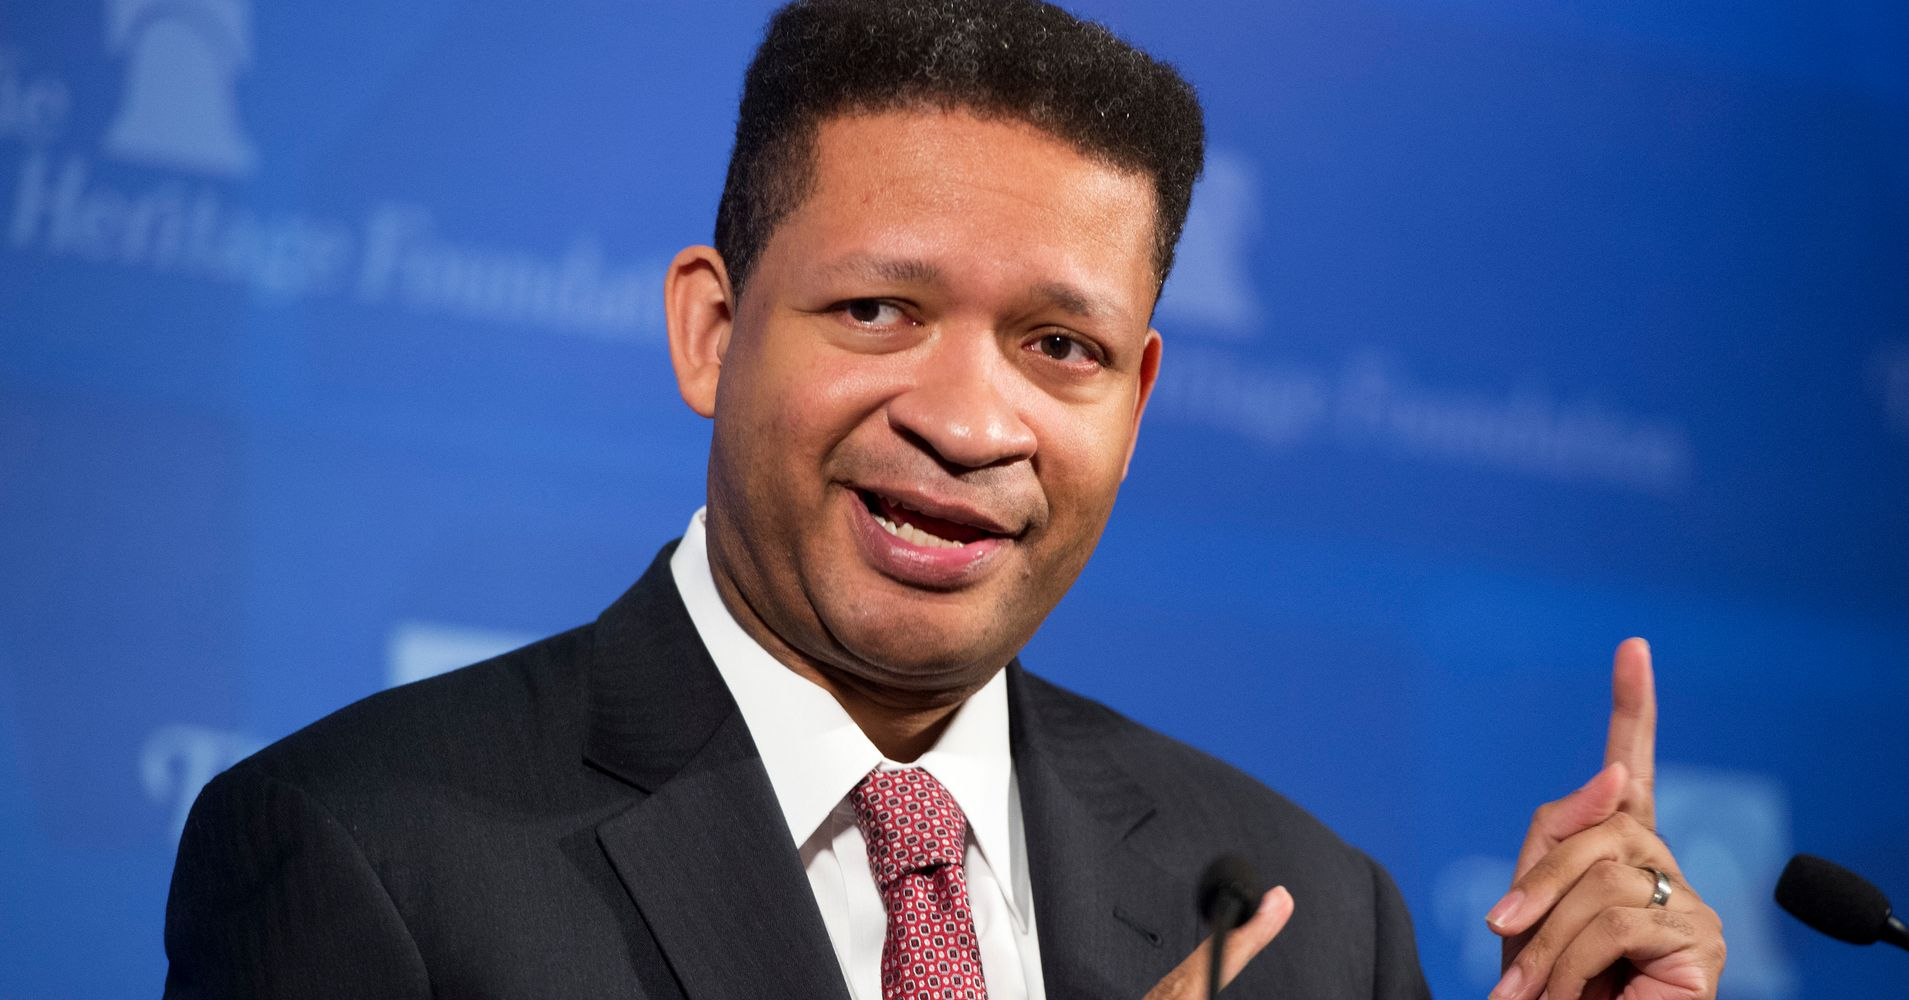 Democrat turned republican black celebrity